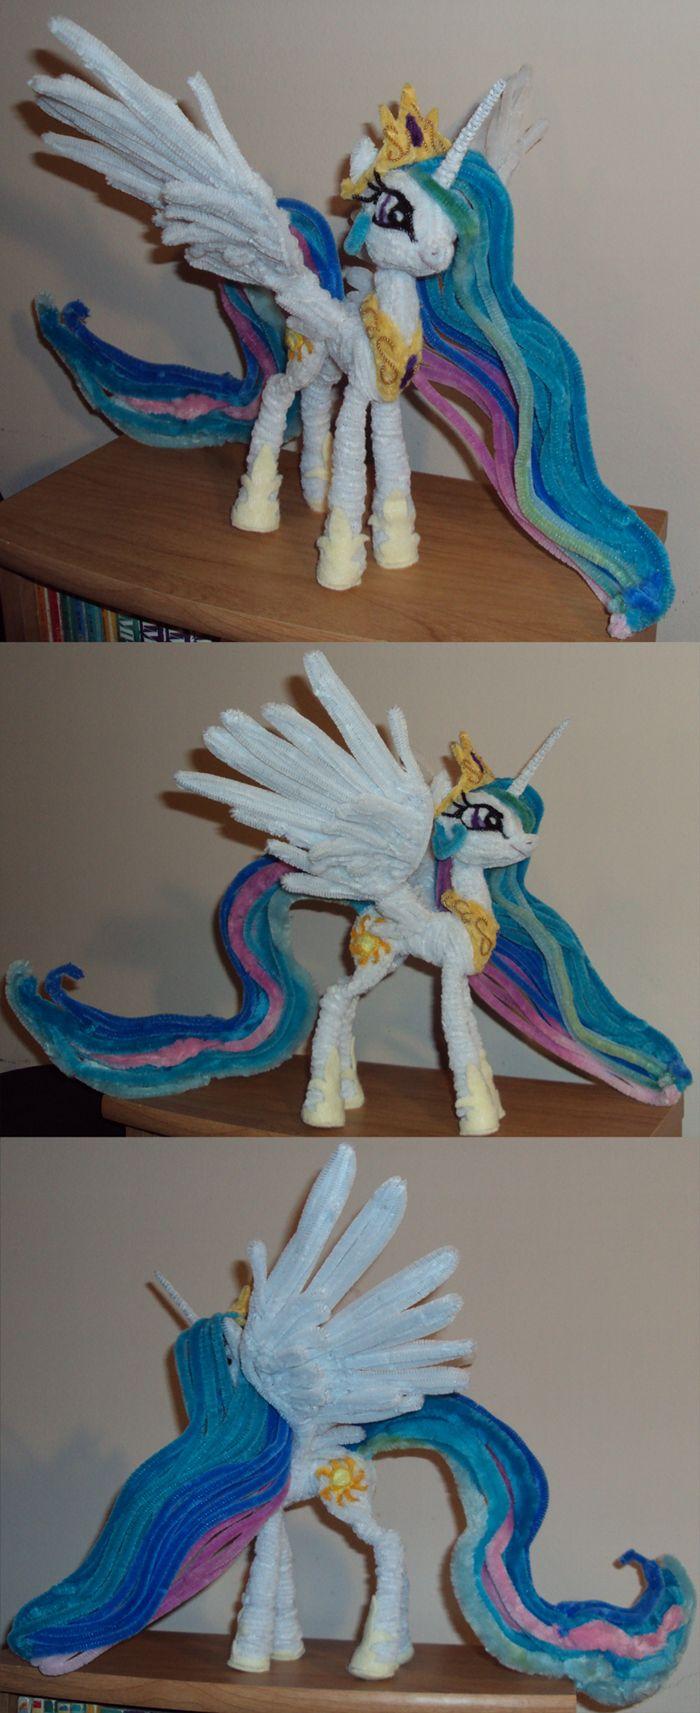 The Princess of Equestria by PonyCrafter.deviantart.com on @deviantART